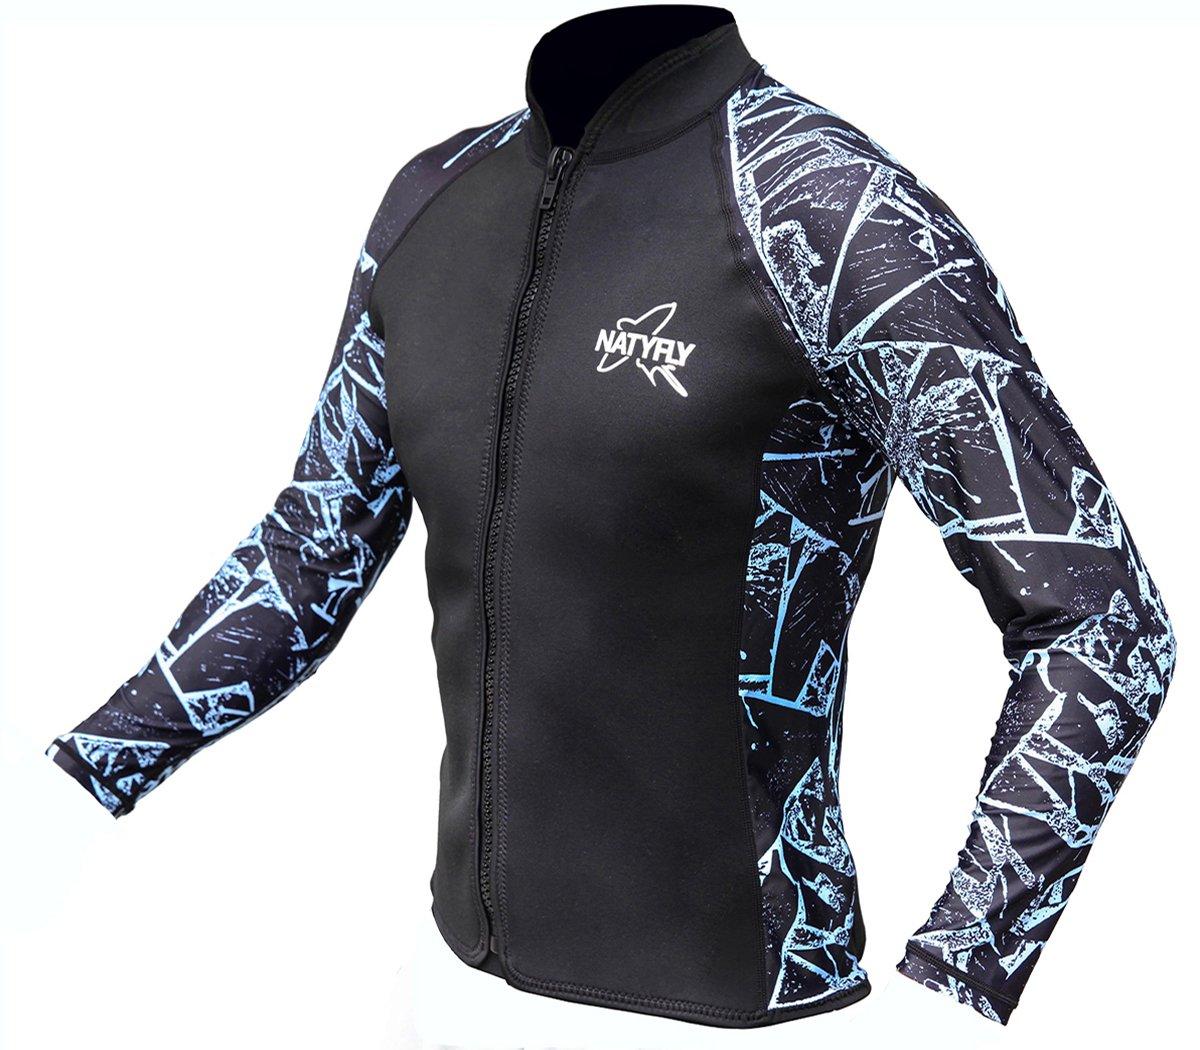 NATYFLY Wetsuit Jacket Long Sleeve Neoprene Wetsuits Top for Men/Women (Blue-Lycra, Medium) by NATYFLY